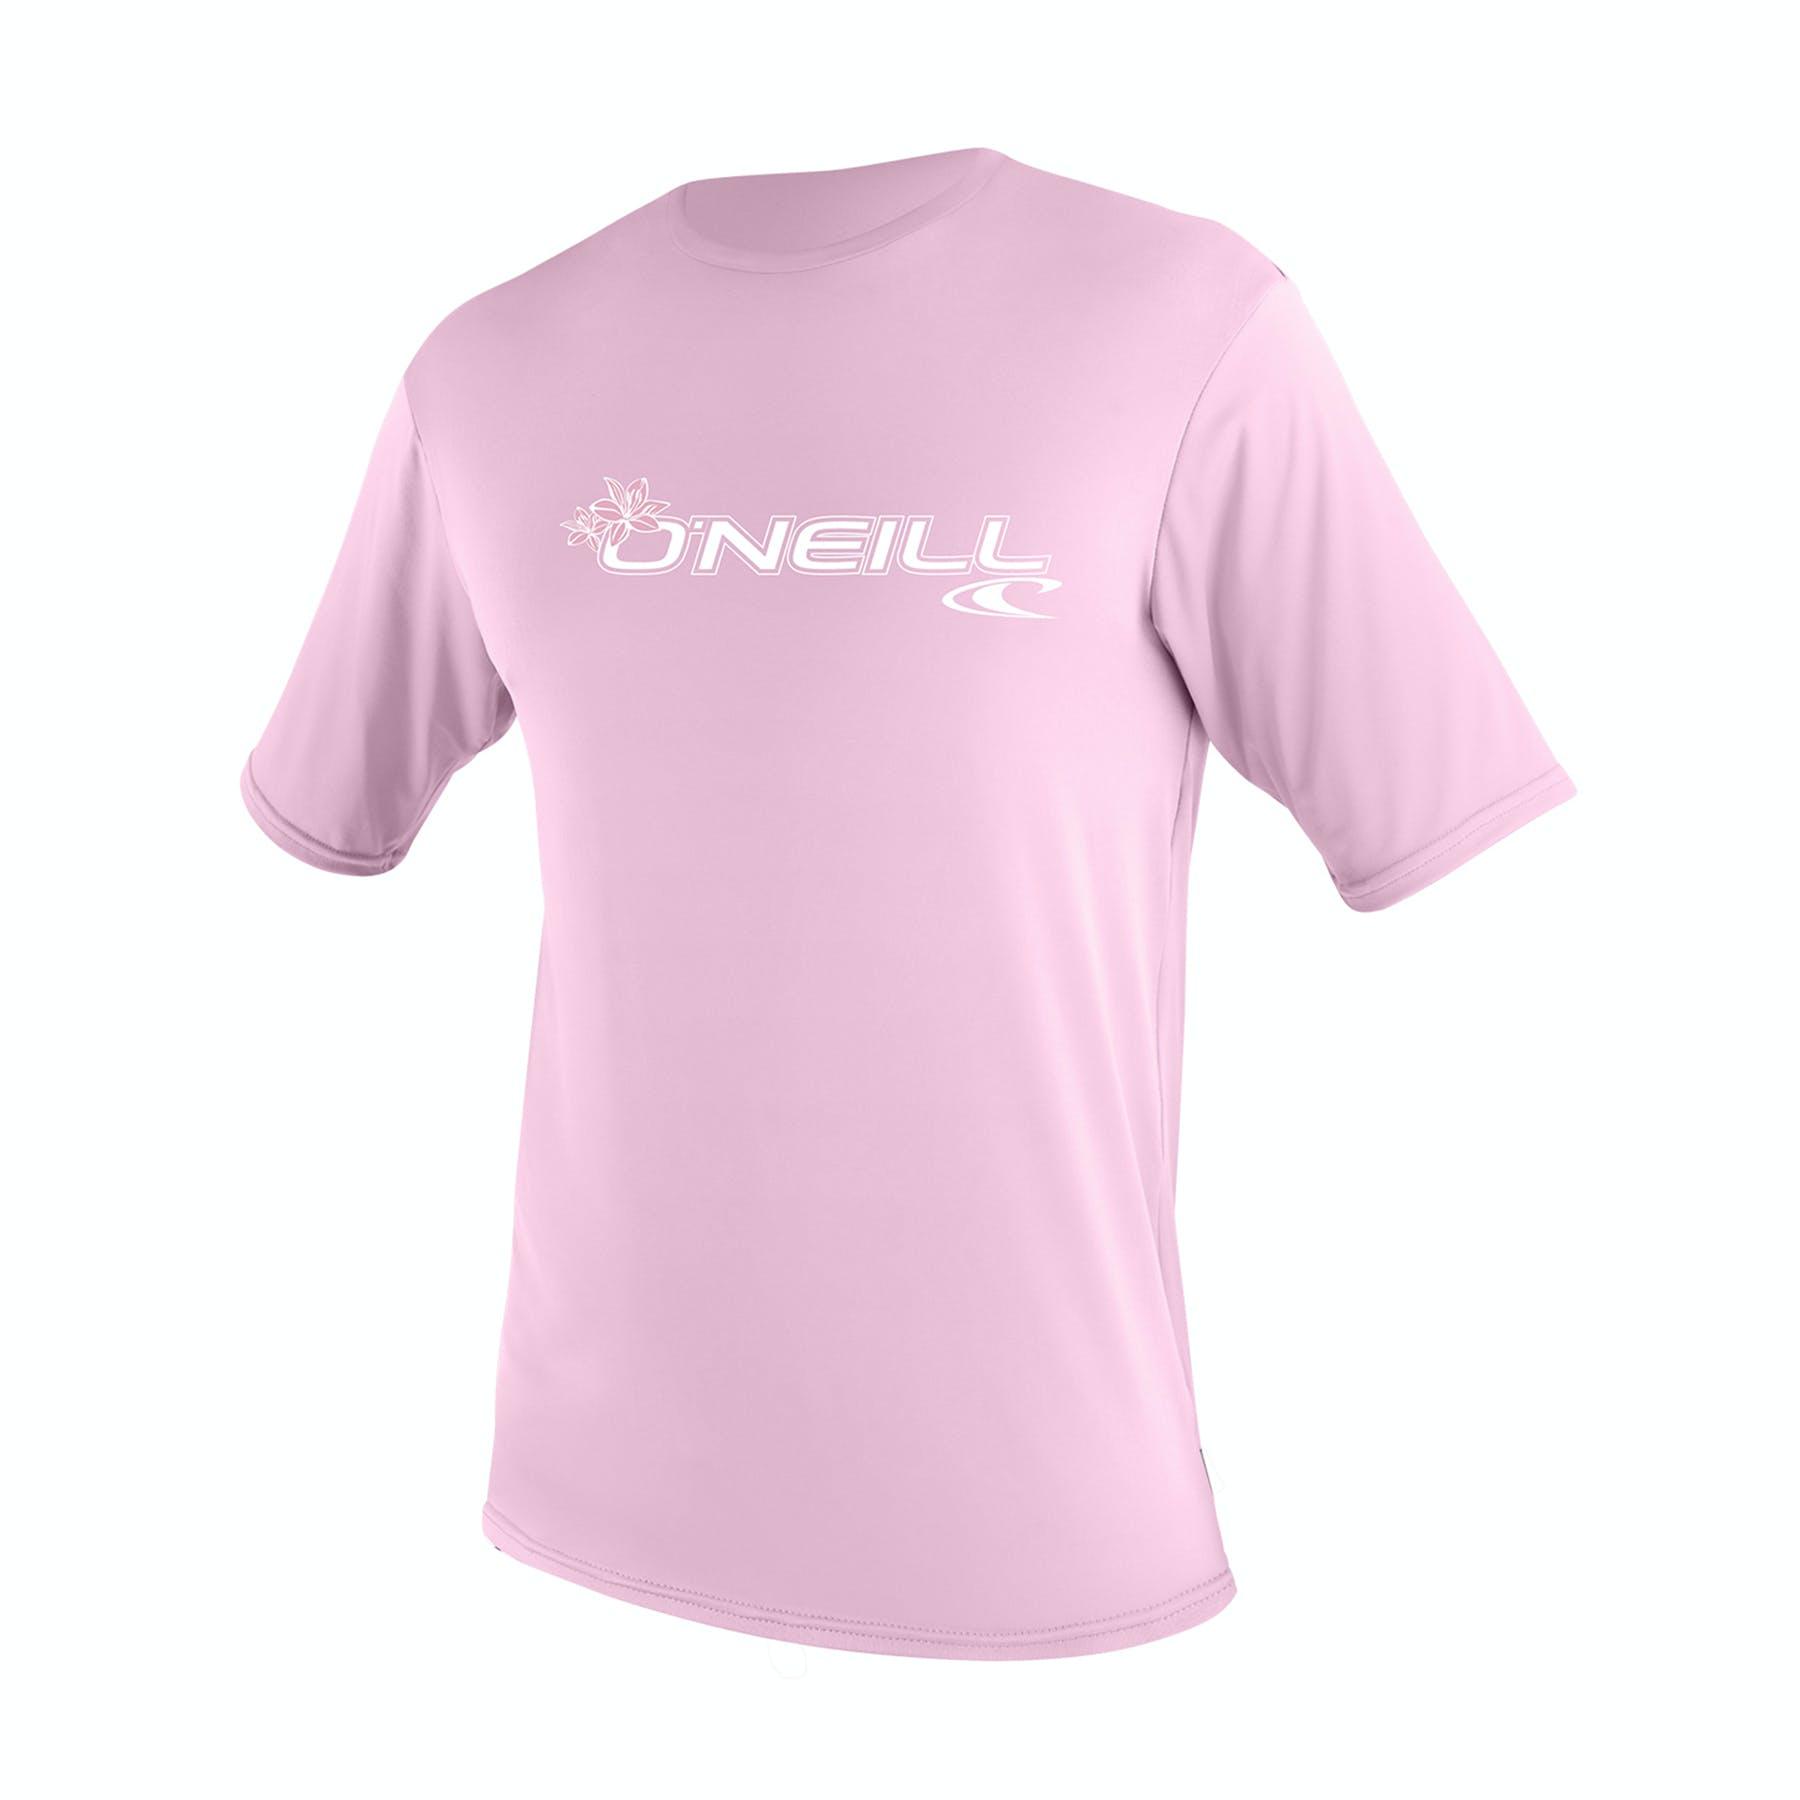 O Neill Toddler Basic Skins Short Sleeve Rash Tee Mädchen Surf T-Shirt